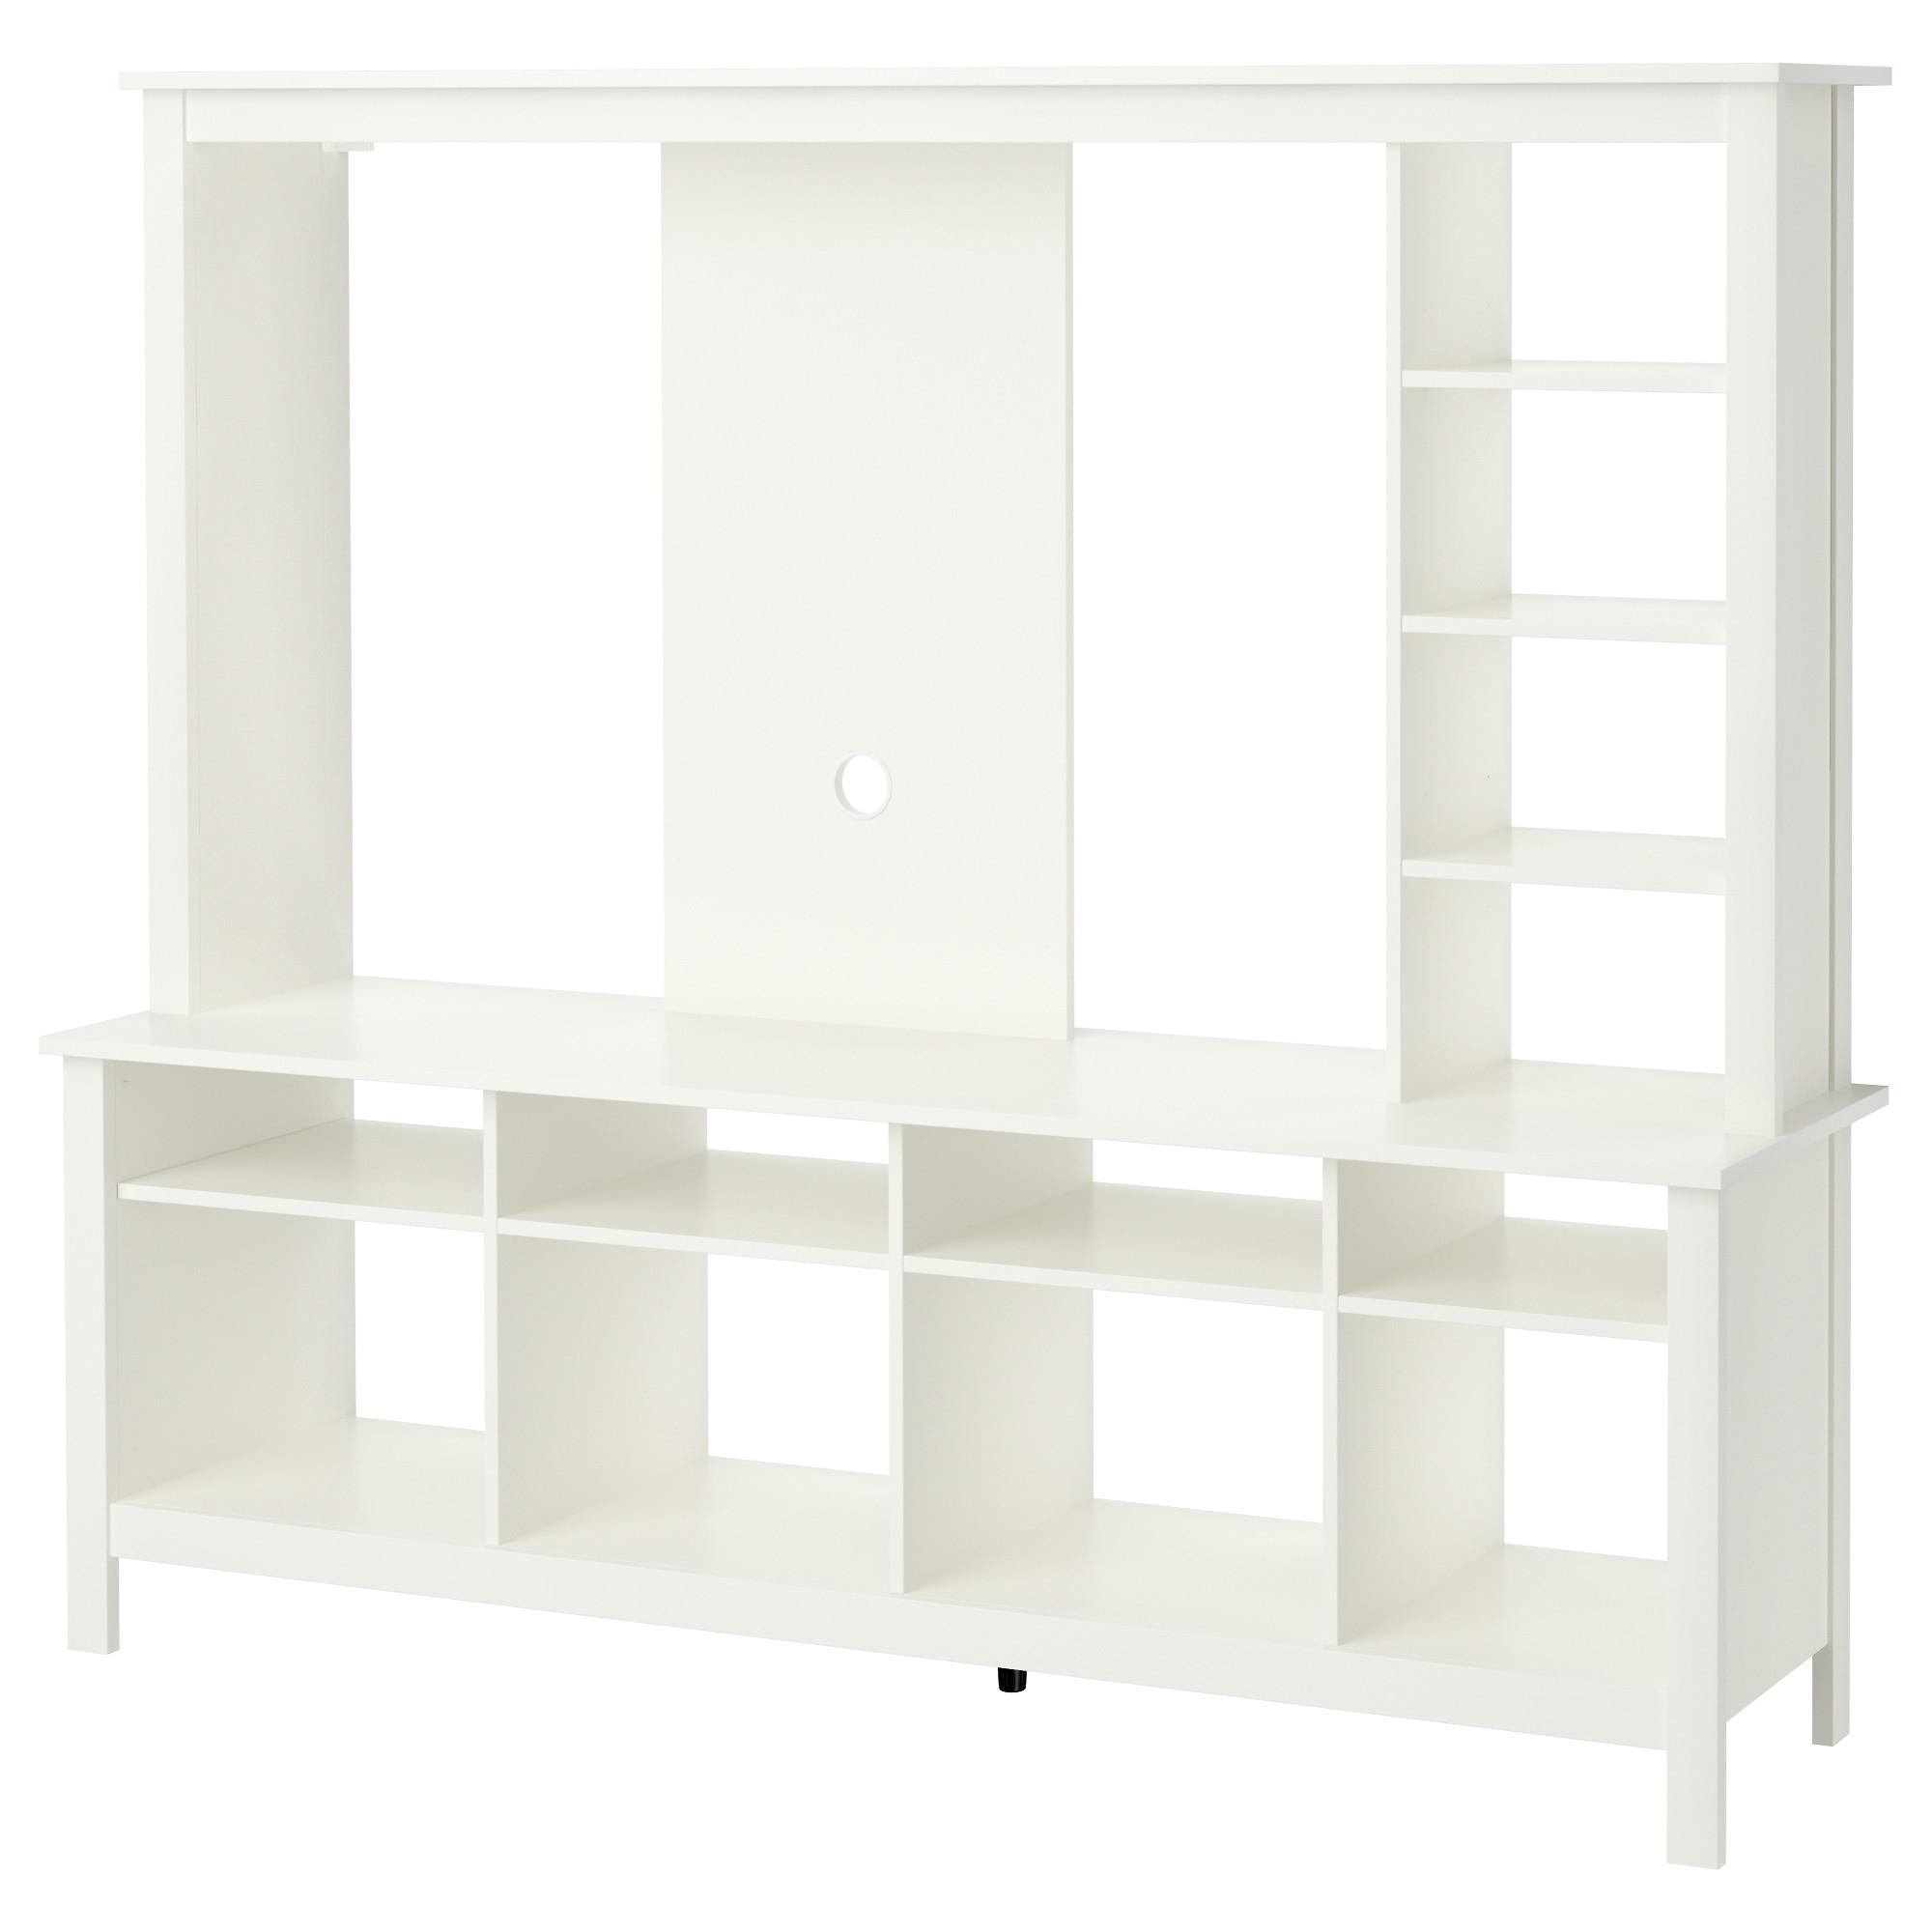 Tomn S Mueble Para Tv # Mueble Toallero Ikea